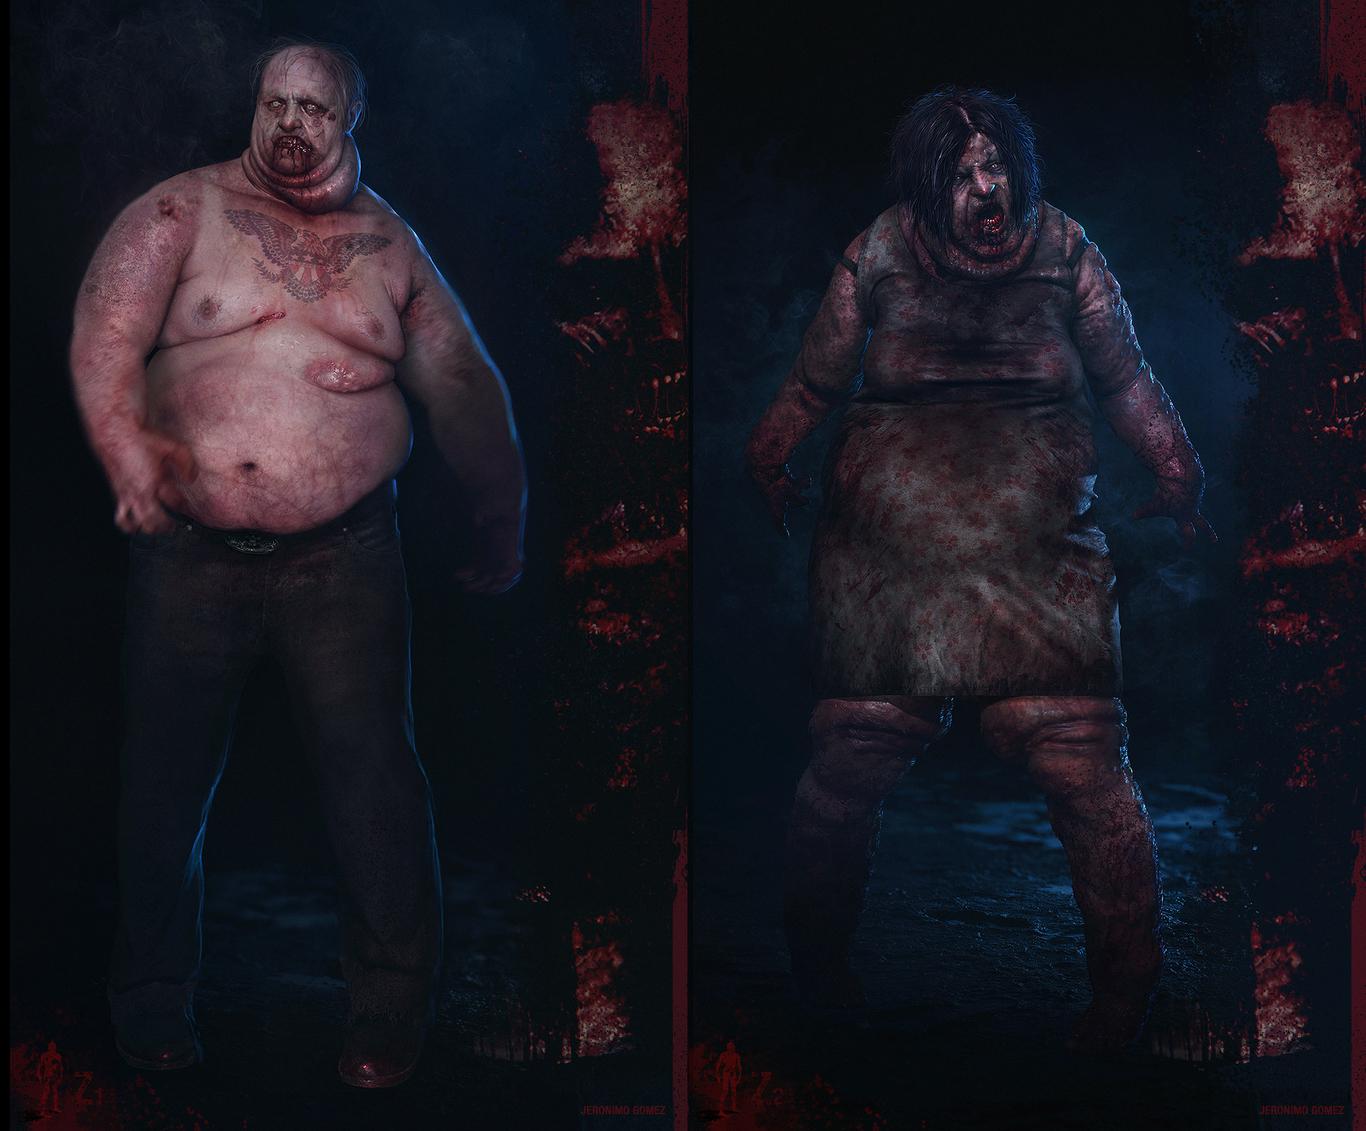 Mray zombie designs 1 8328750a uxcl